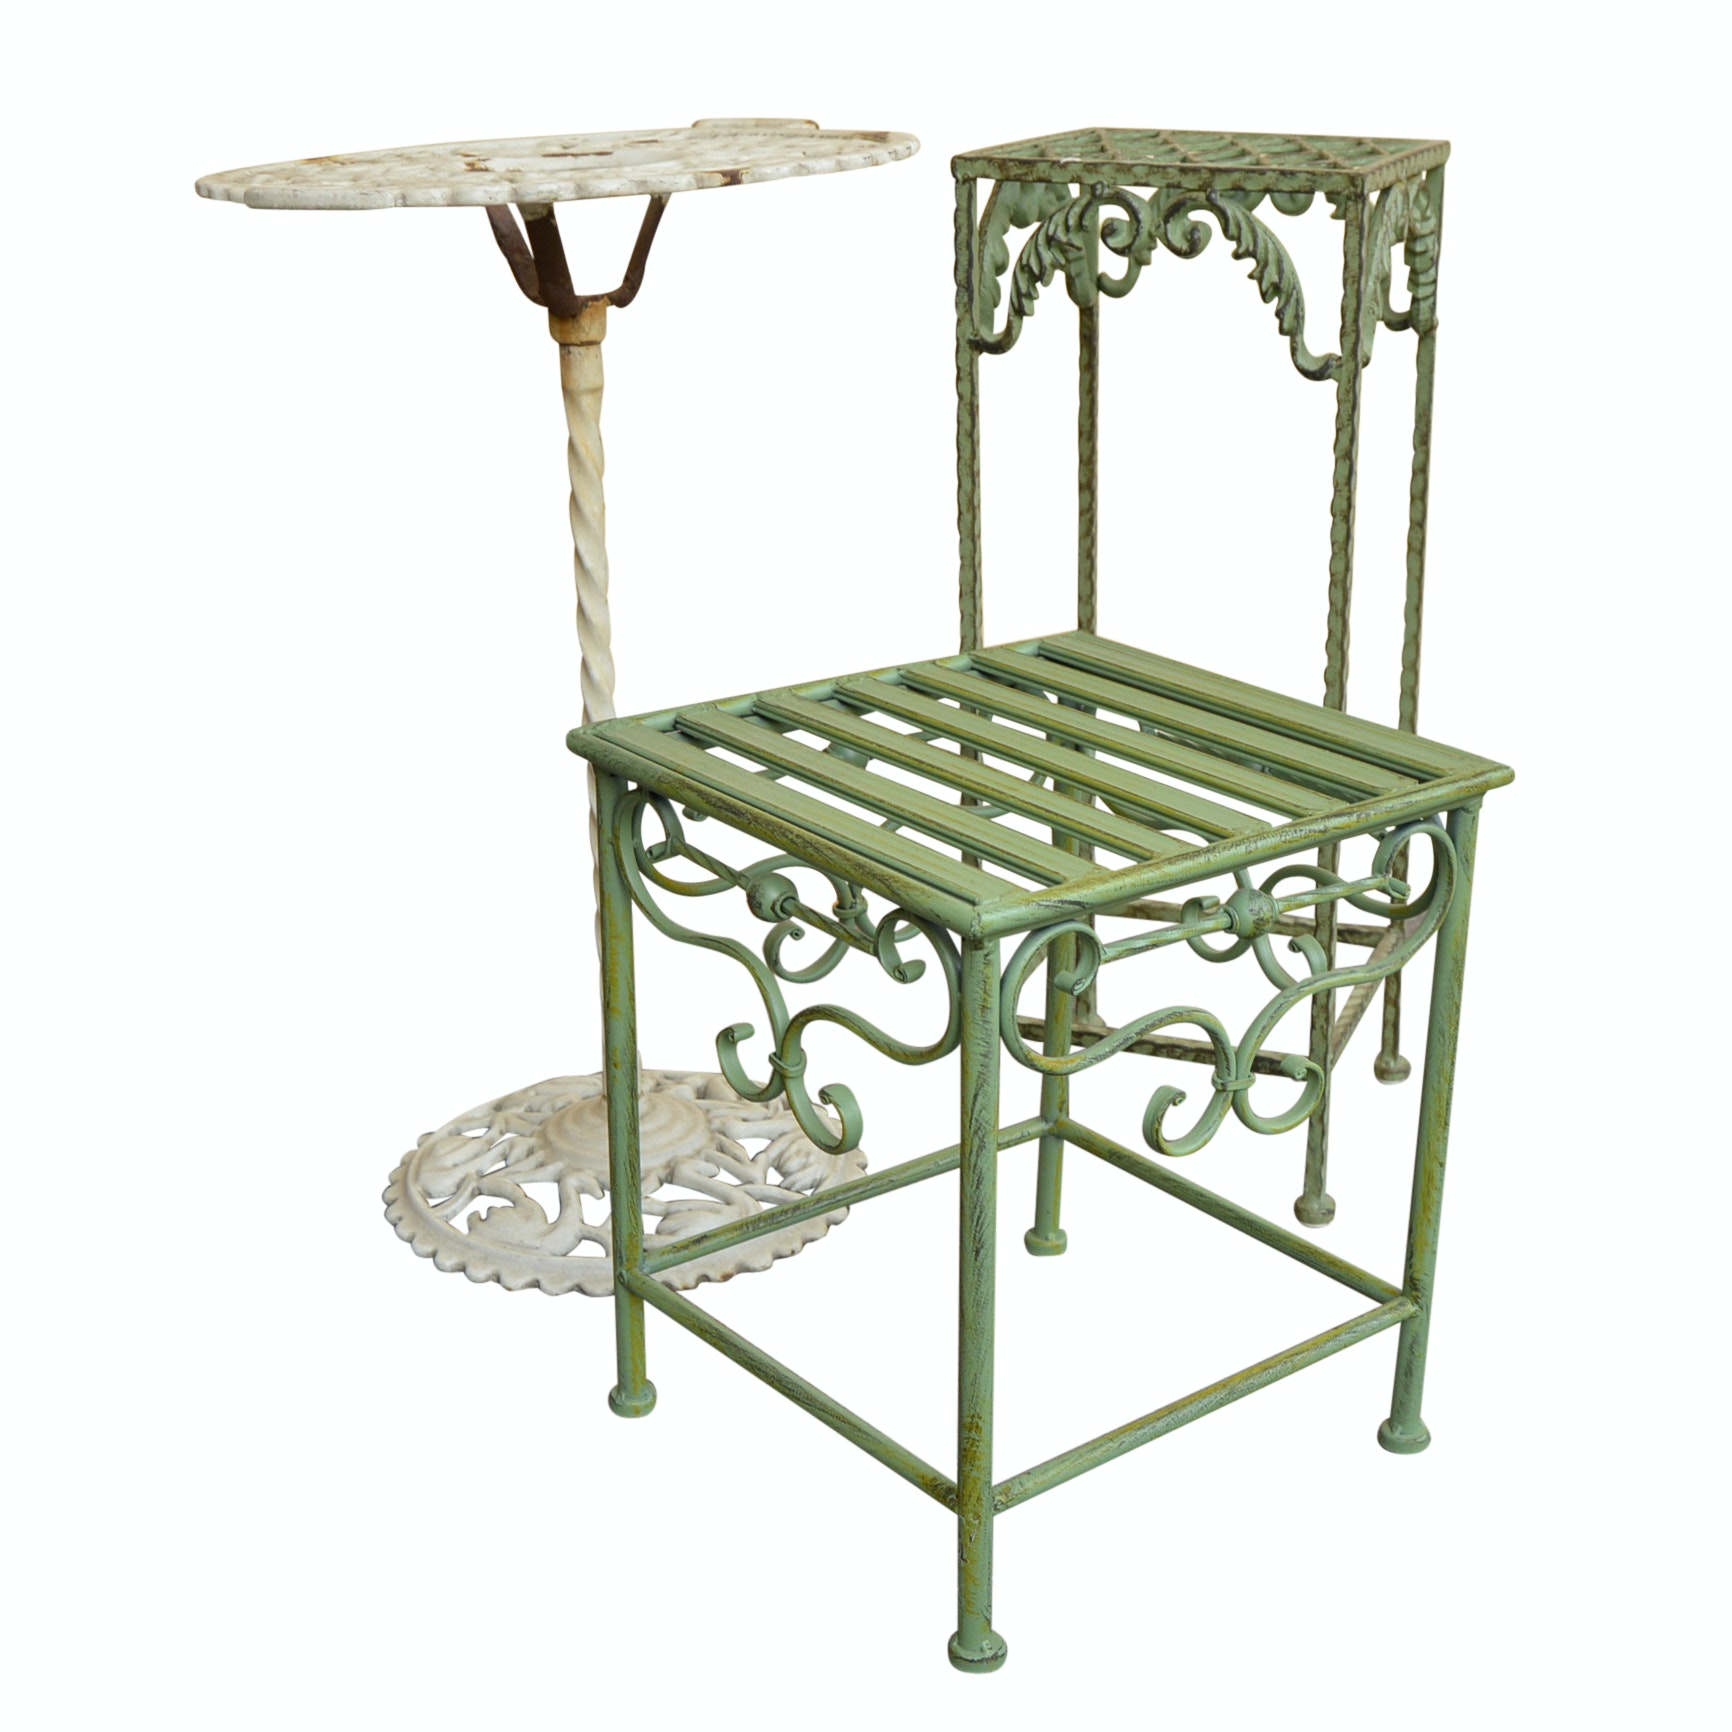 Metal Garden Tables